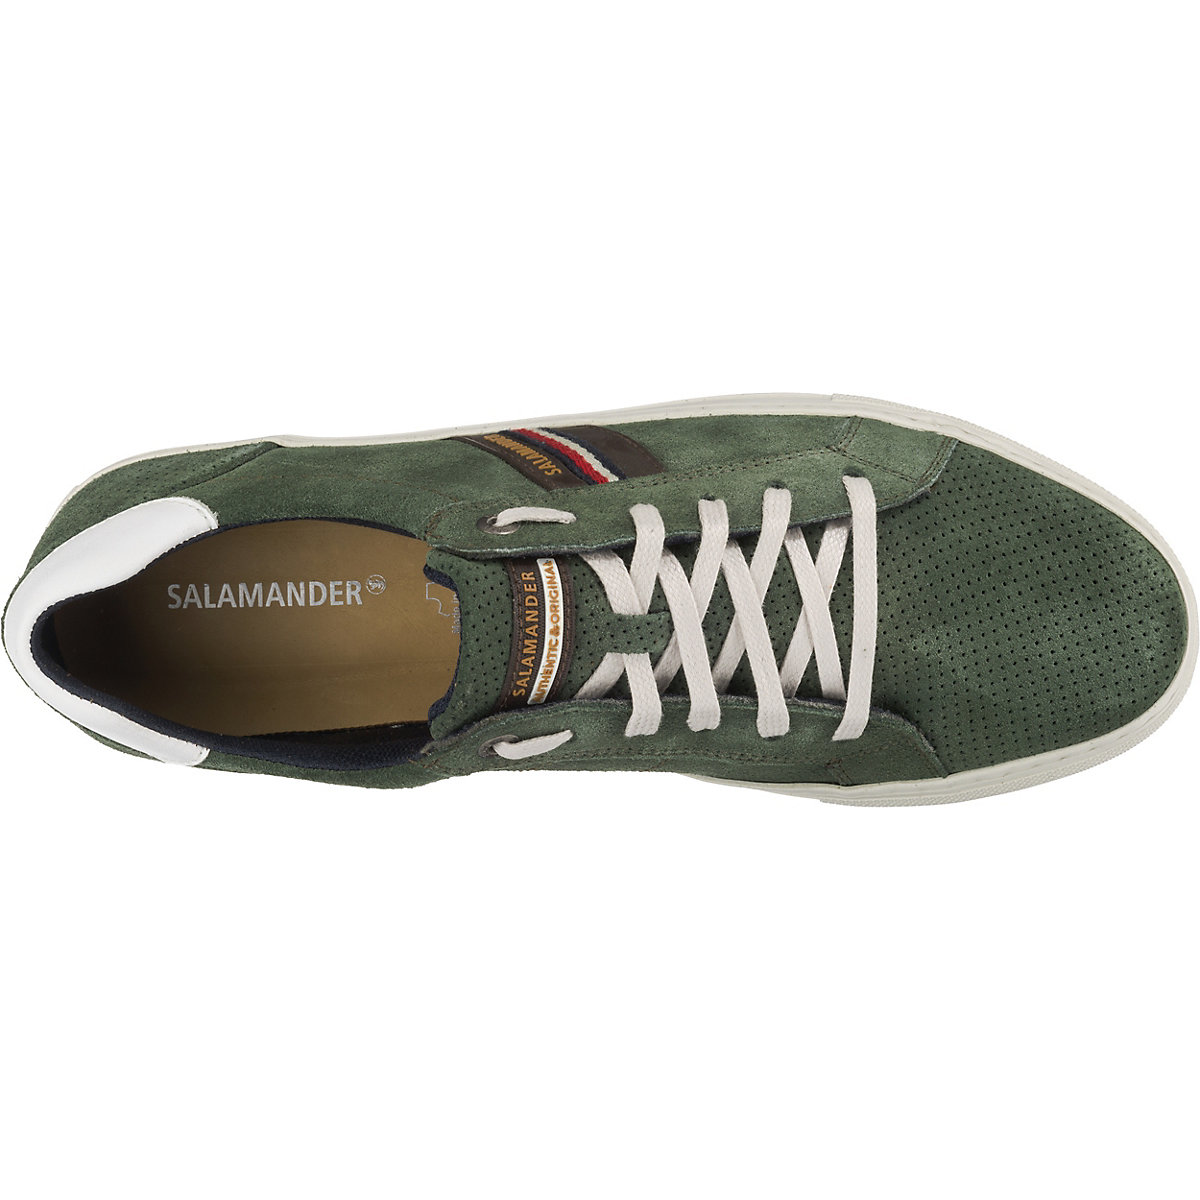 Salamander, Ginotto Sneakers Low, Dunkelgrün